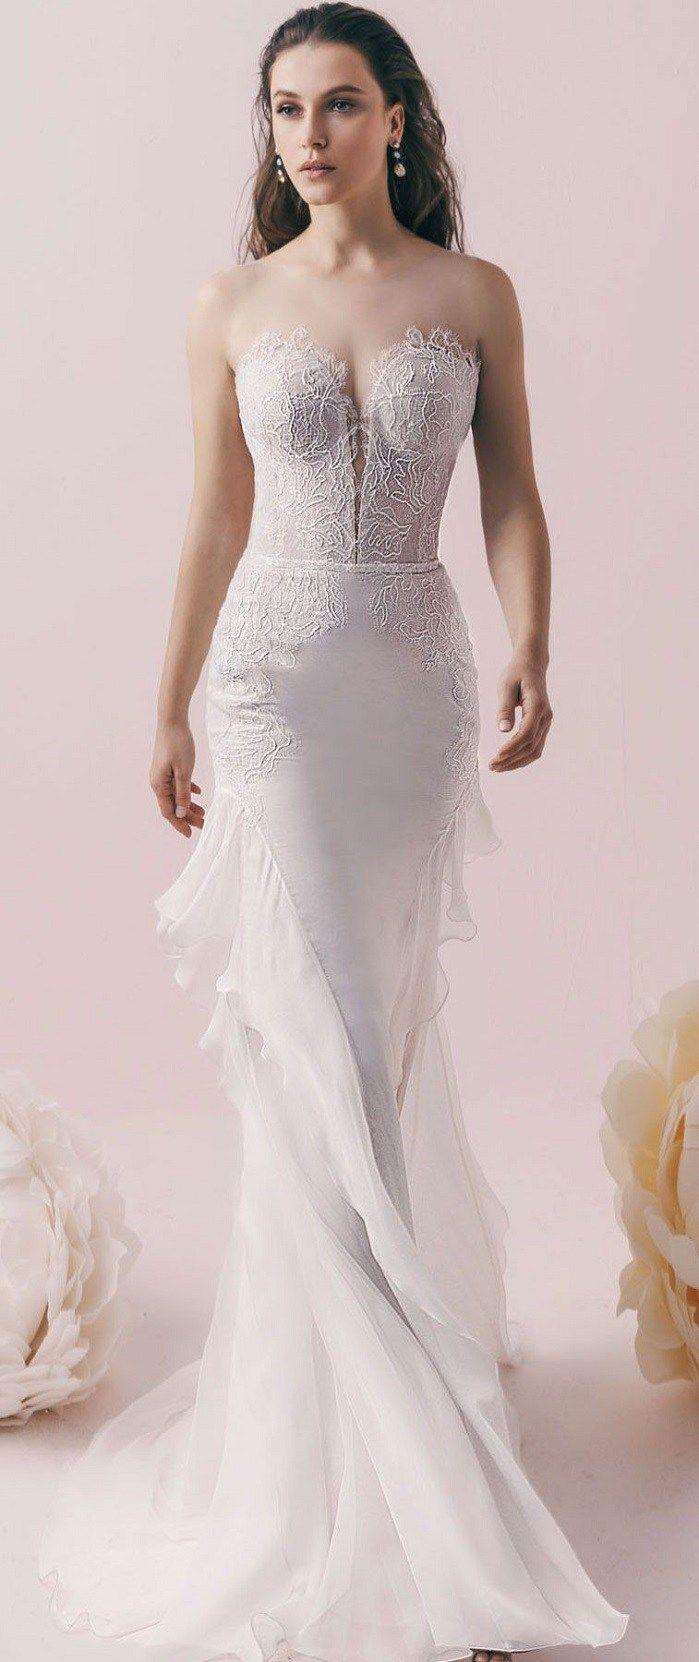 Irena burshtein wedding dresses wedding ideas pinterest